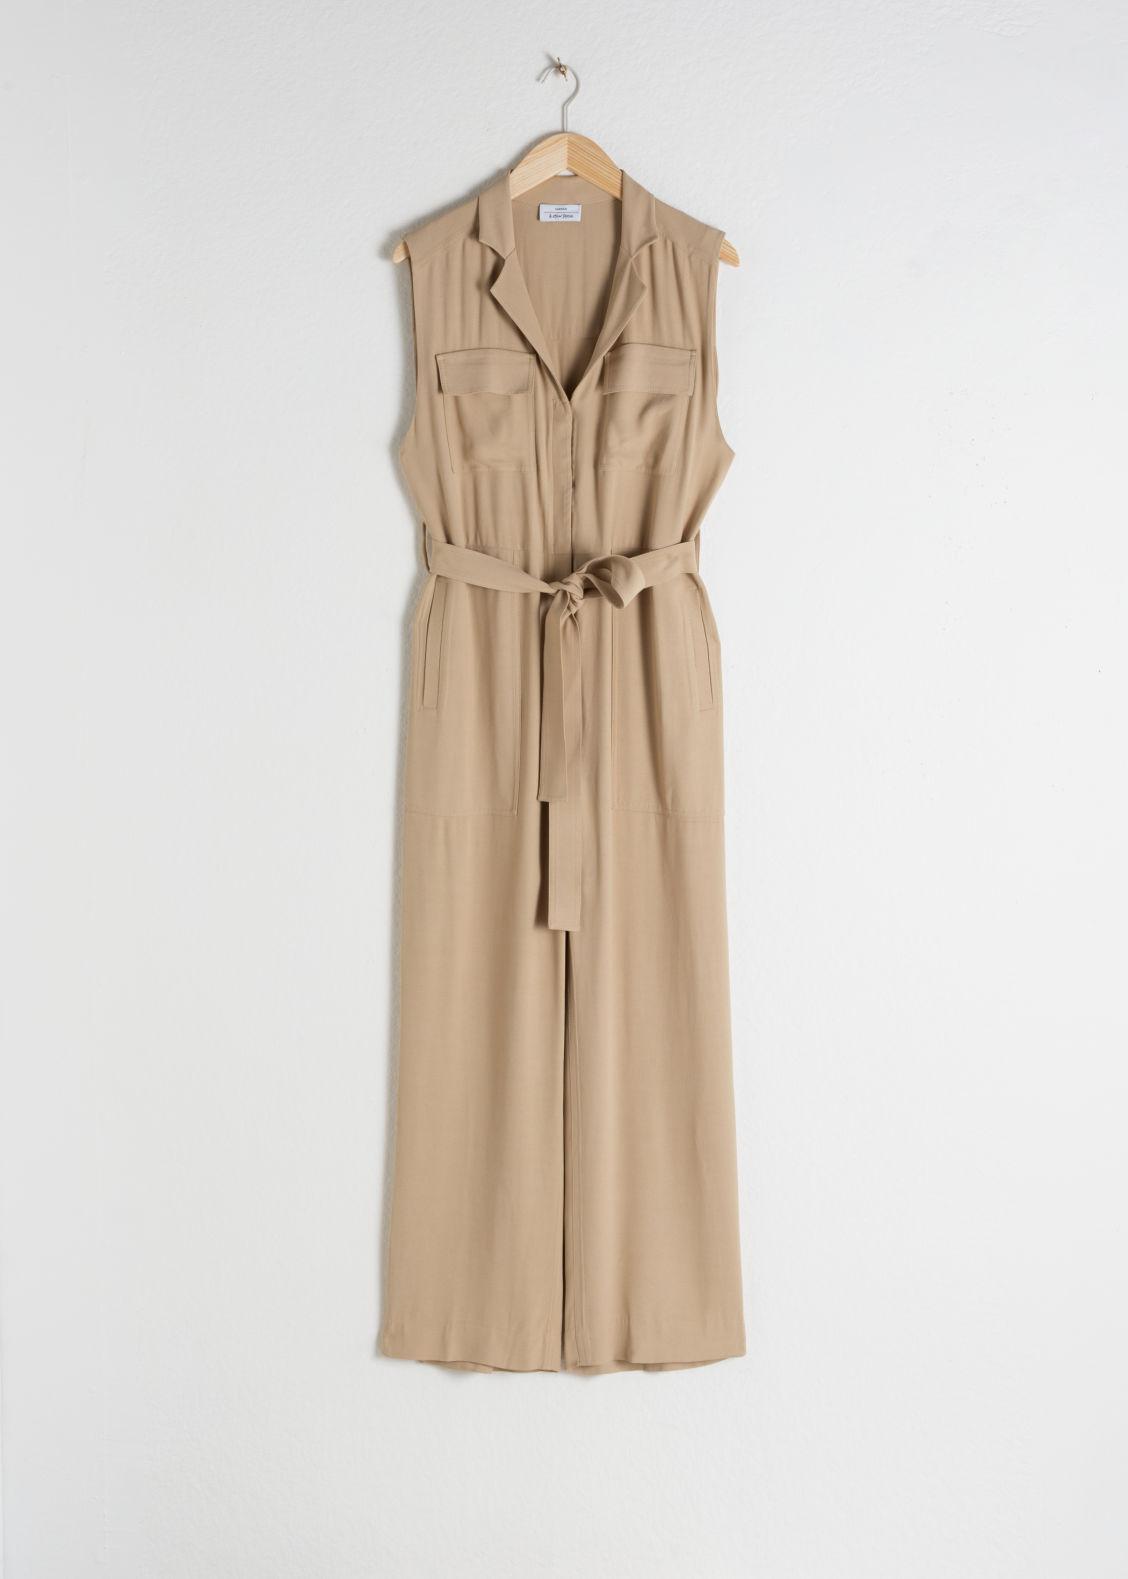 c018b5e9d10e ... Dress Midi dresses - clothing_dresses_mididresses € 99 € 99 Pink  CAPSULE COLLECTION. Belted Sleeveless Jumpsuit